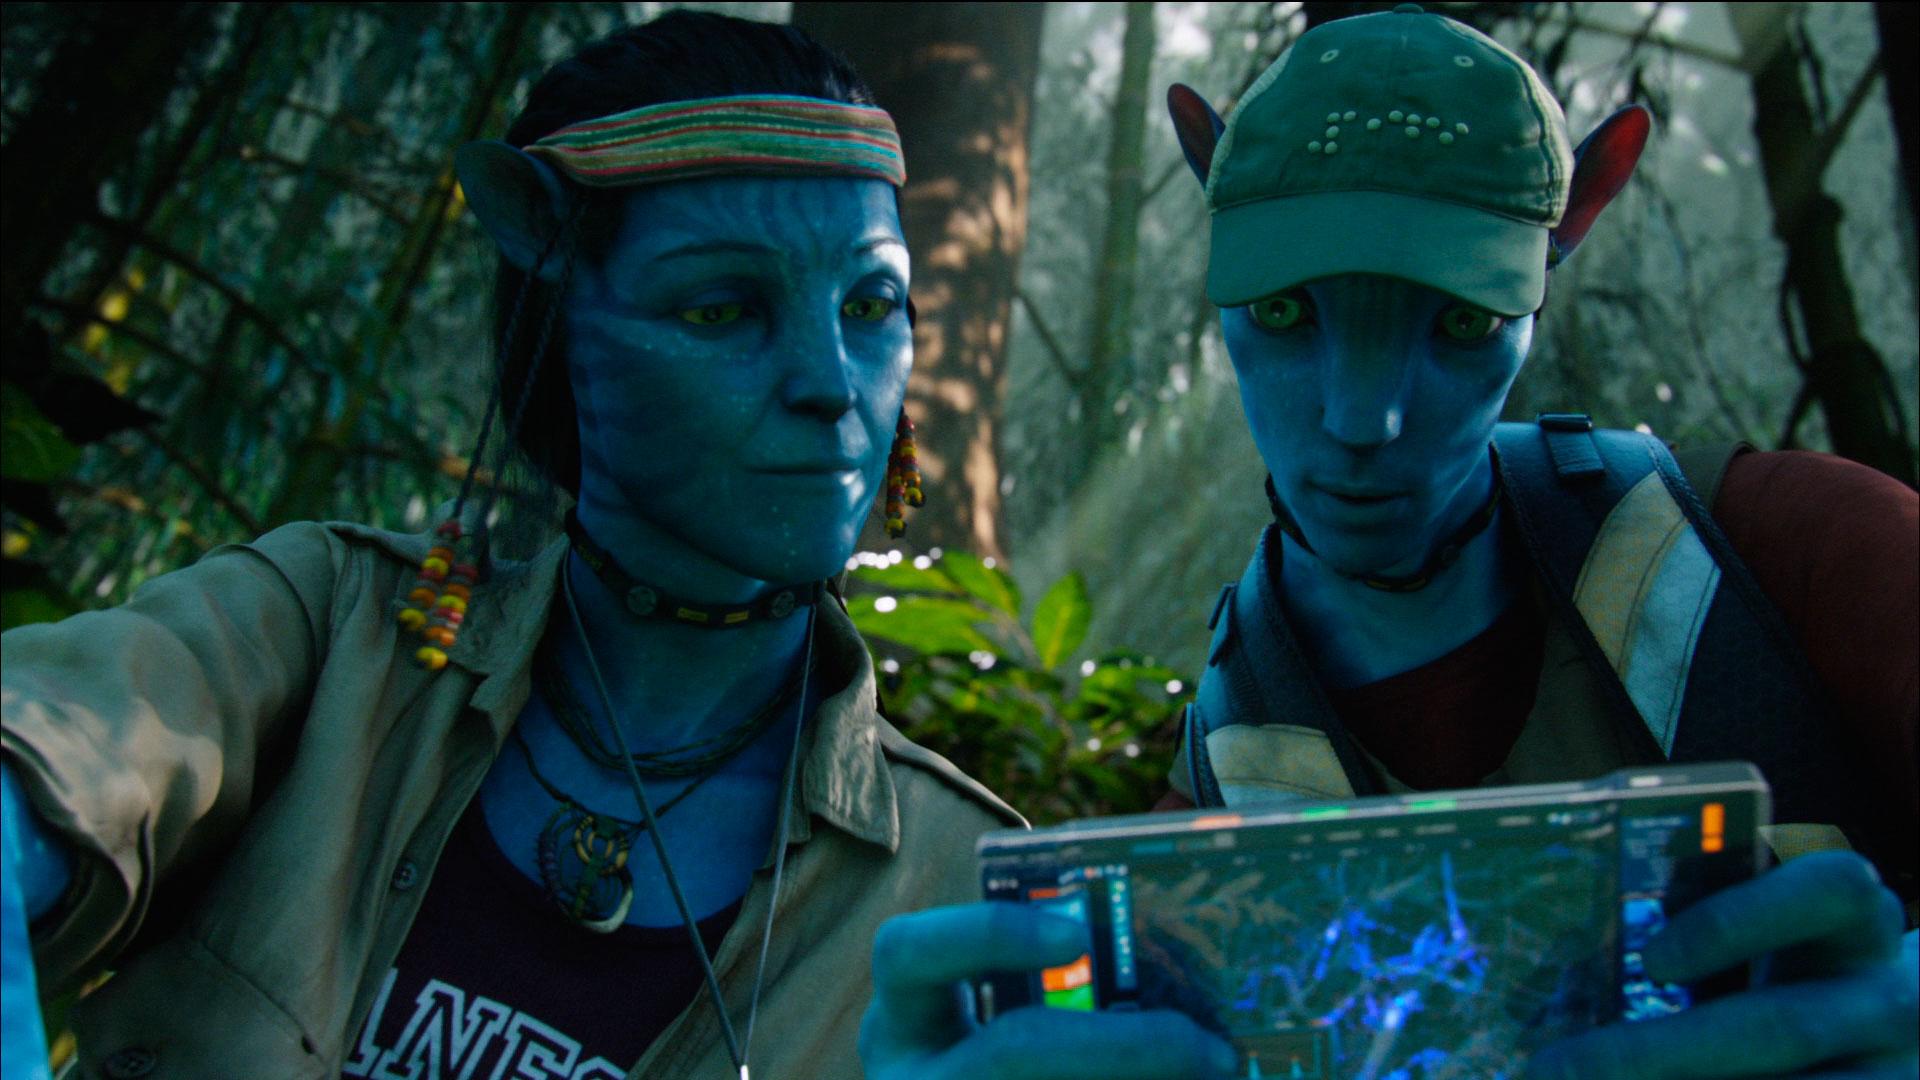 Descubren que los árboles se conectan como en Avatar